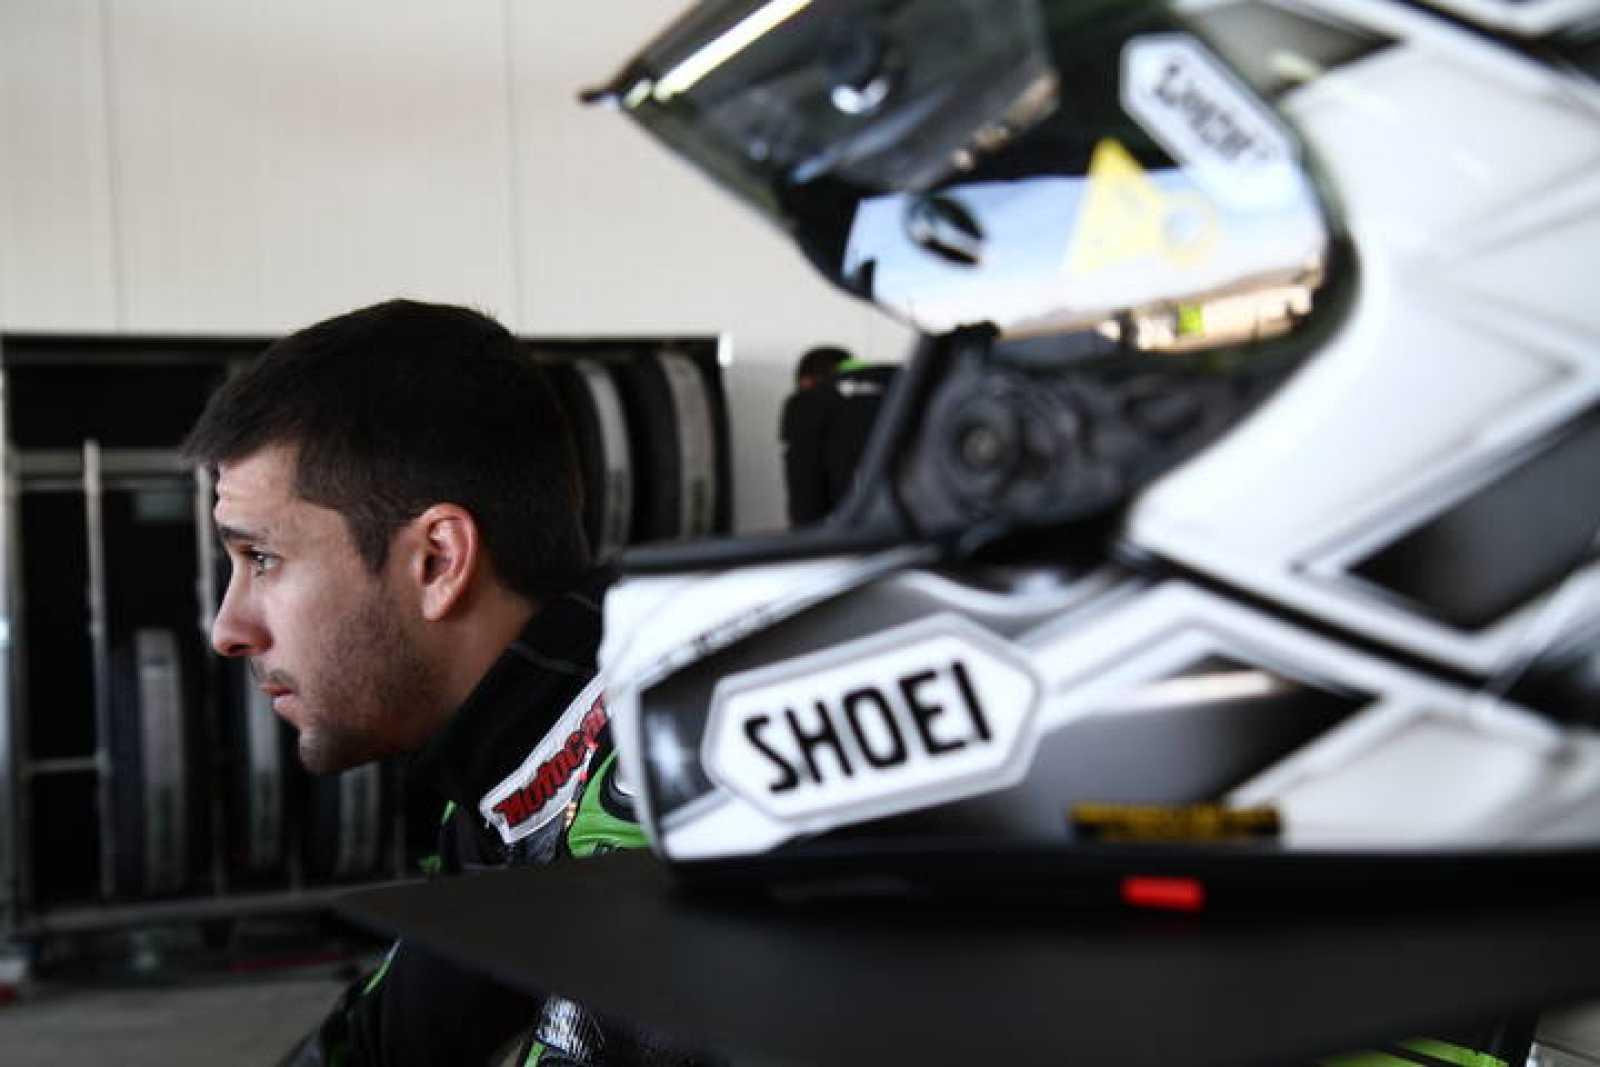 El piloto español de Superbike Joan Lascorz